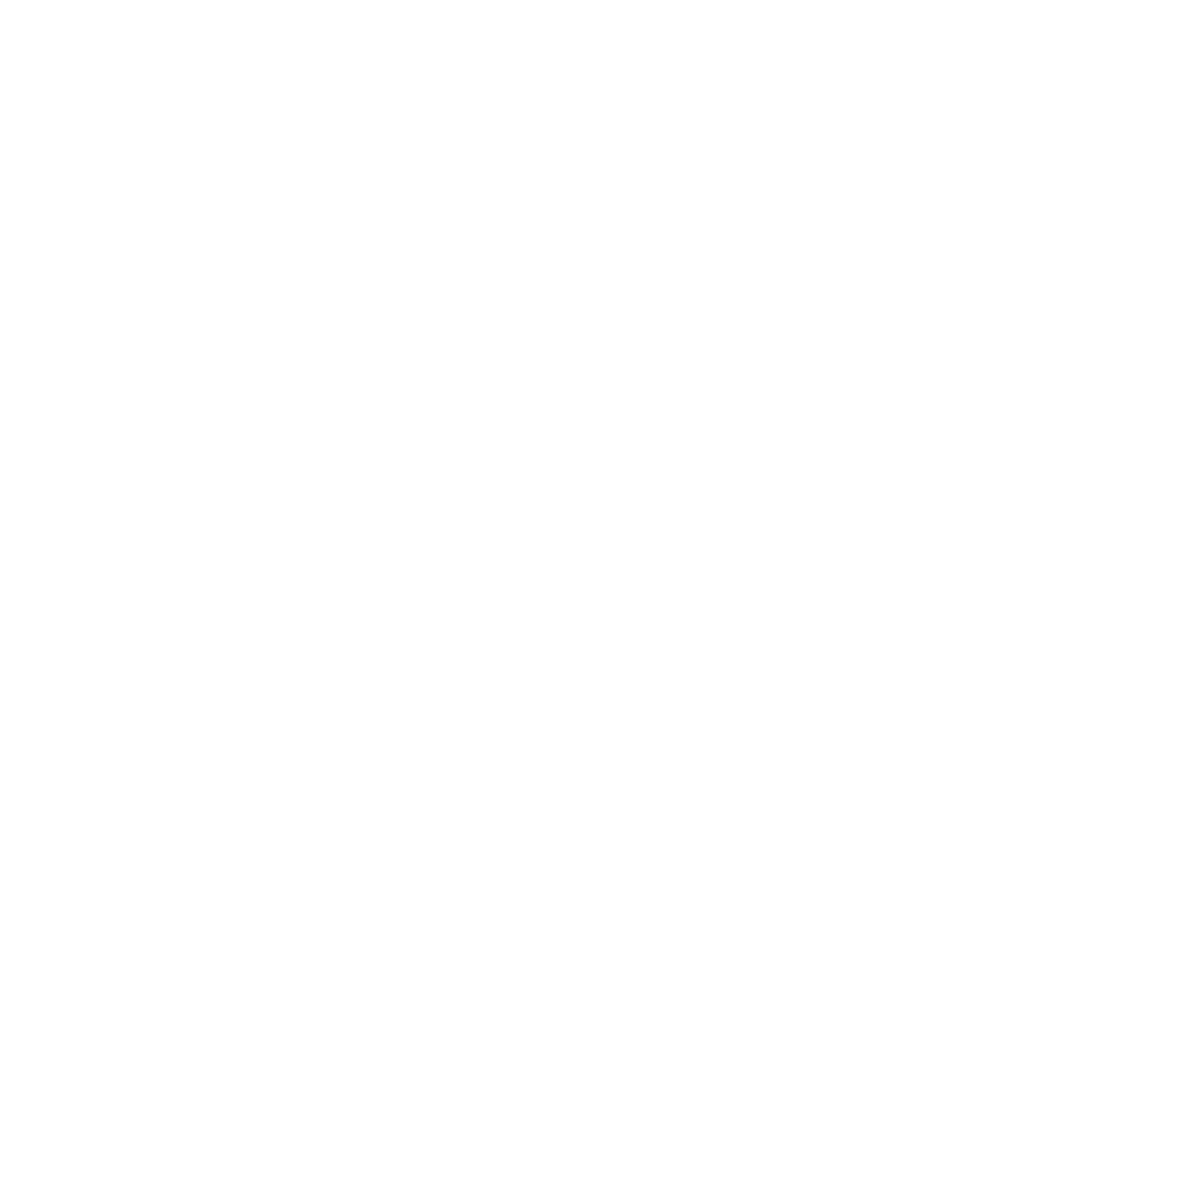 msnbc-white